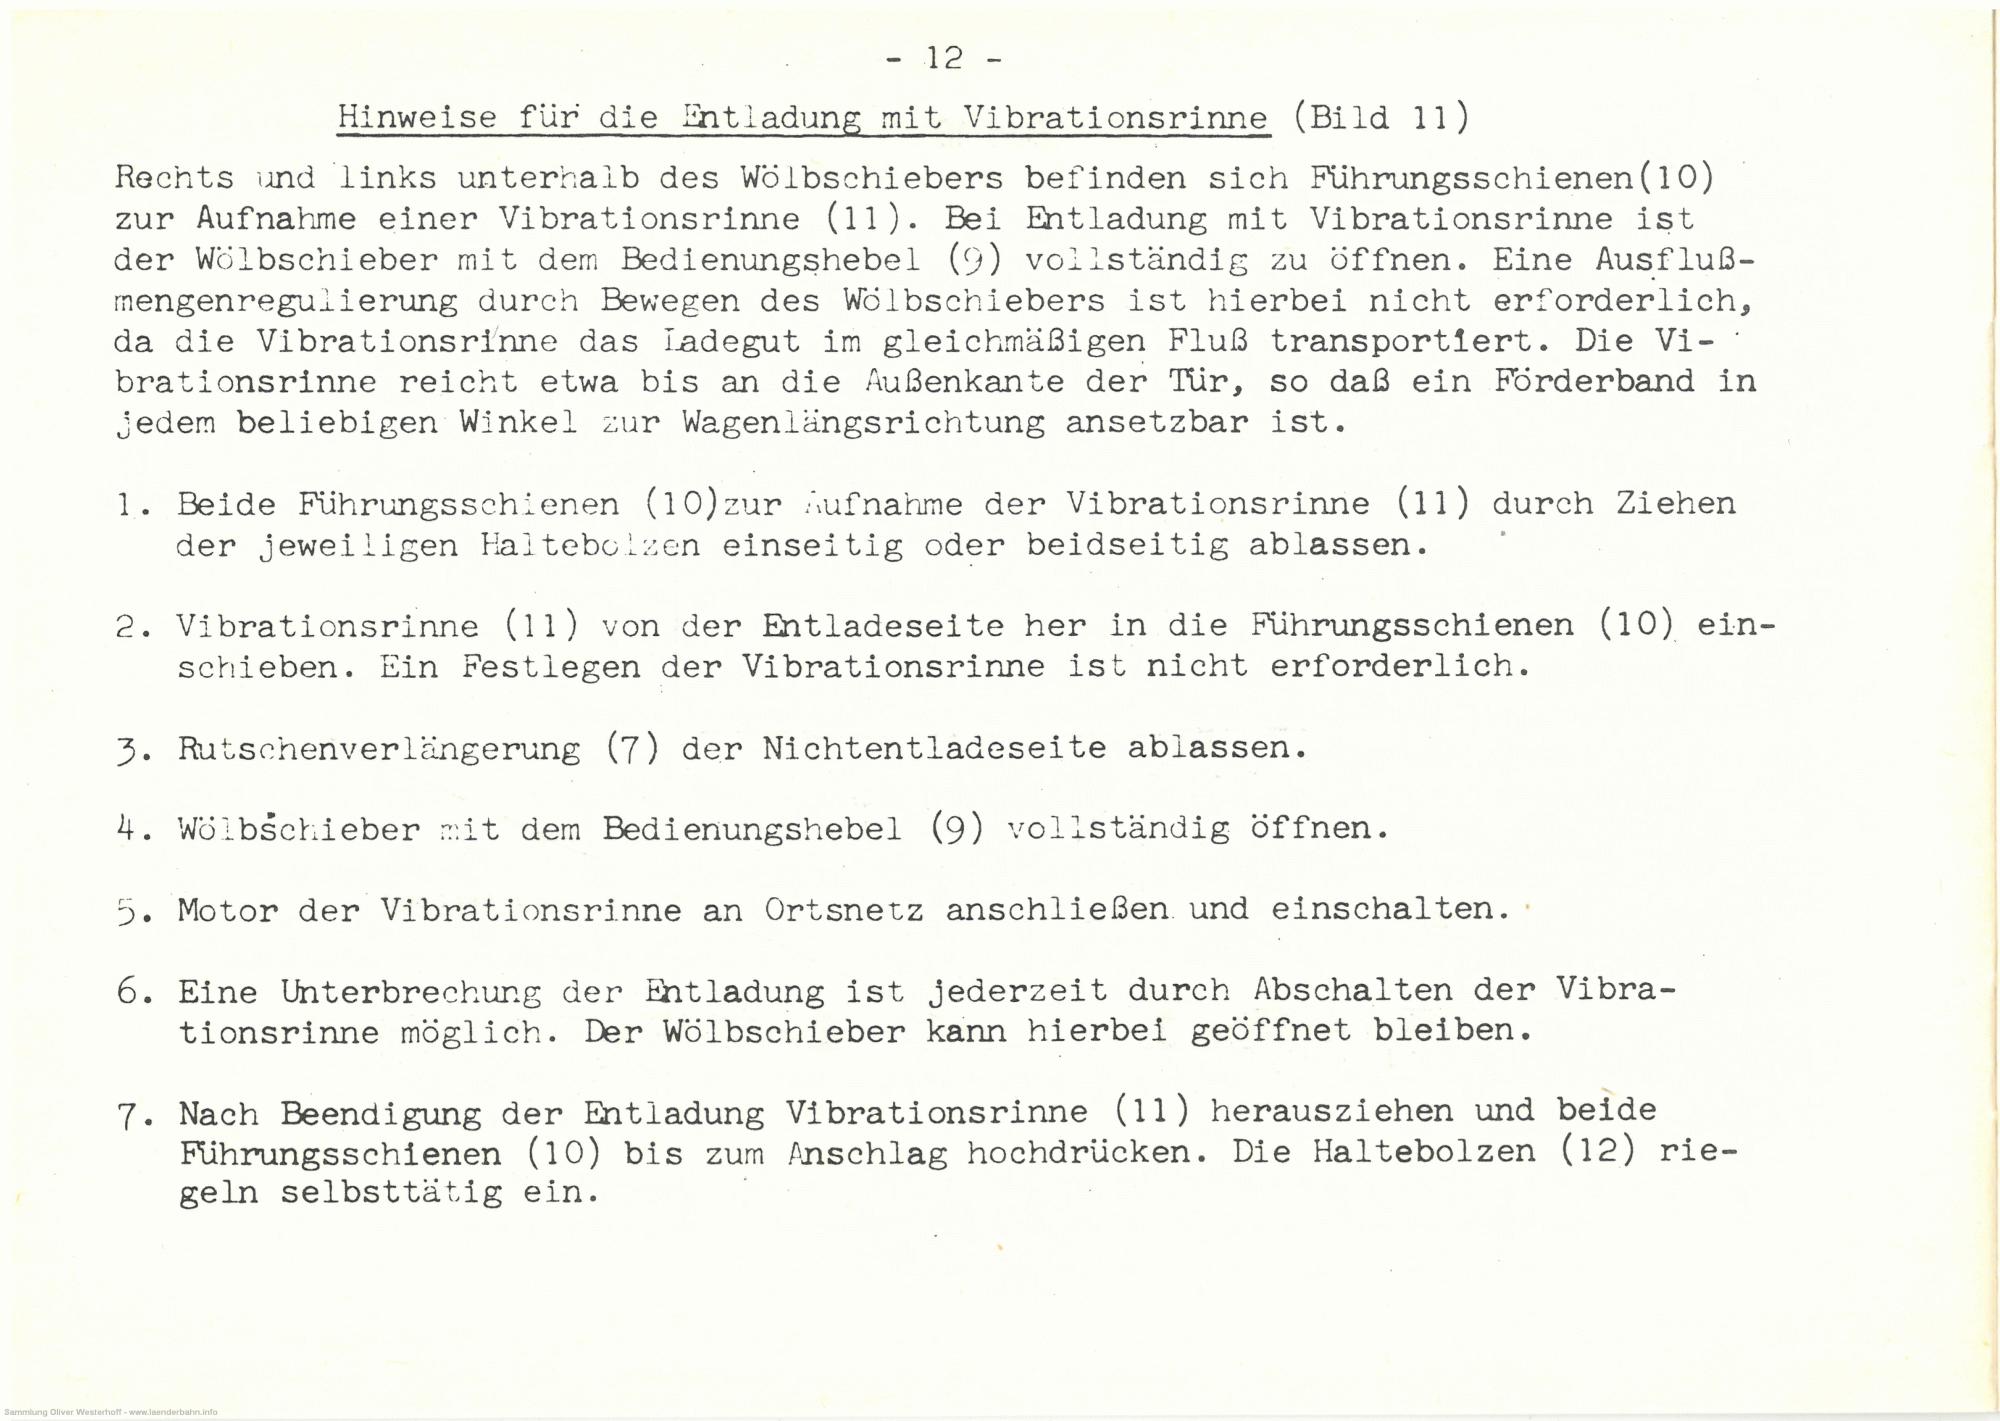 https://www.laenderbahn.info/hifo/20181008/ommv72_seite_0016.png